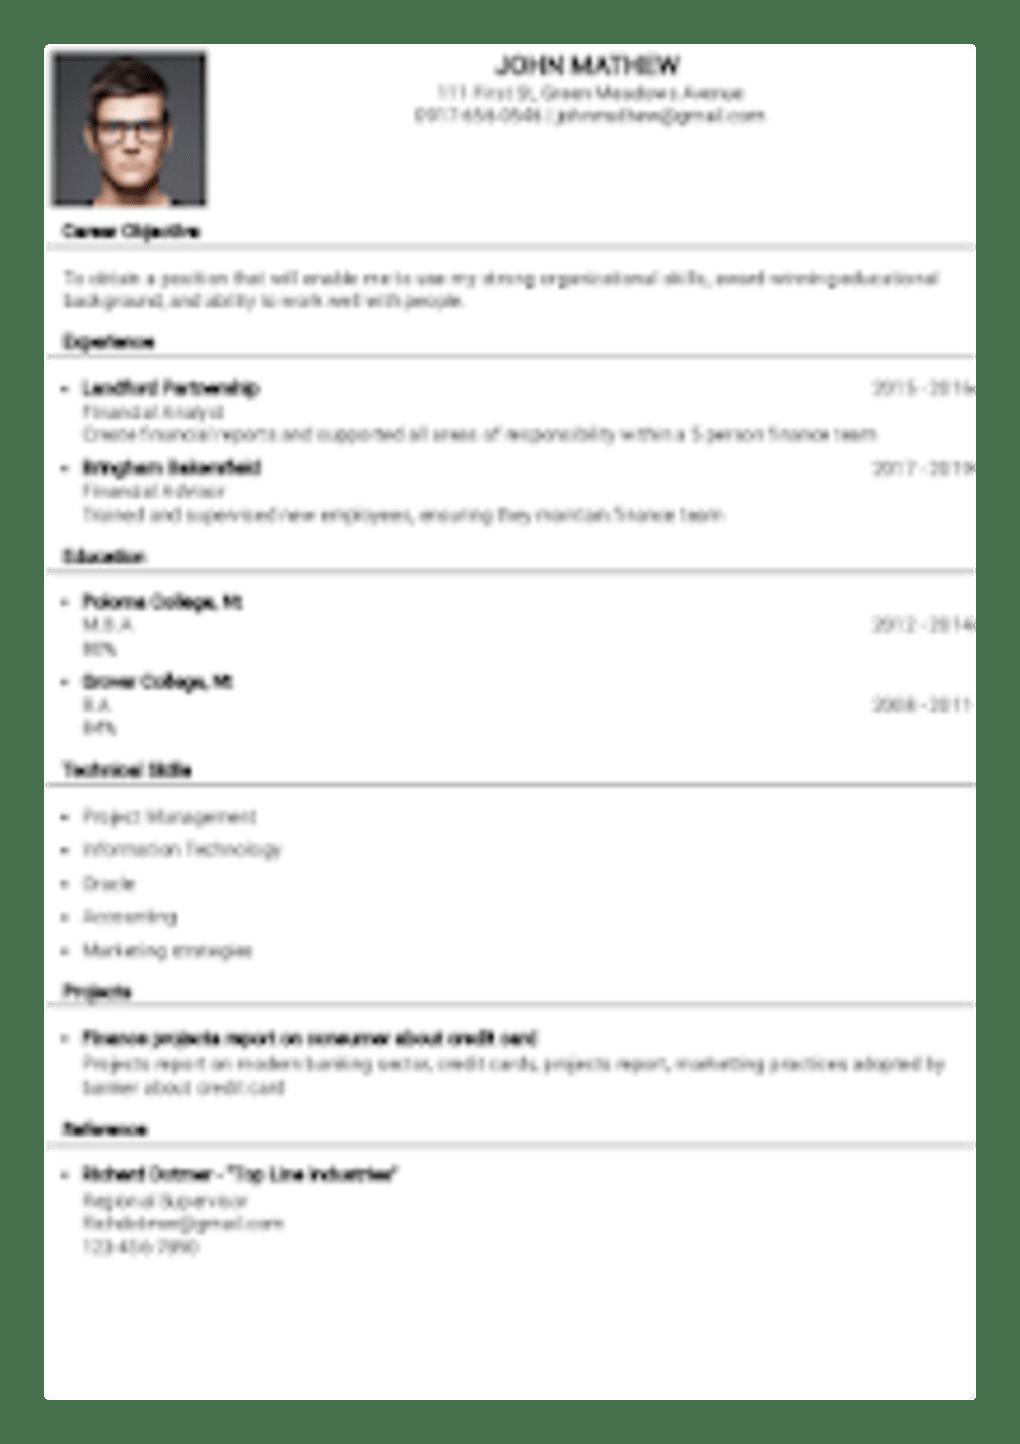 Resume Builder For Free Download